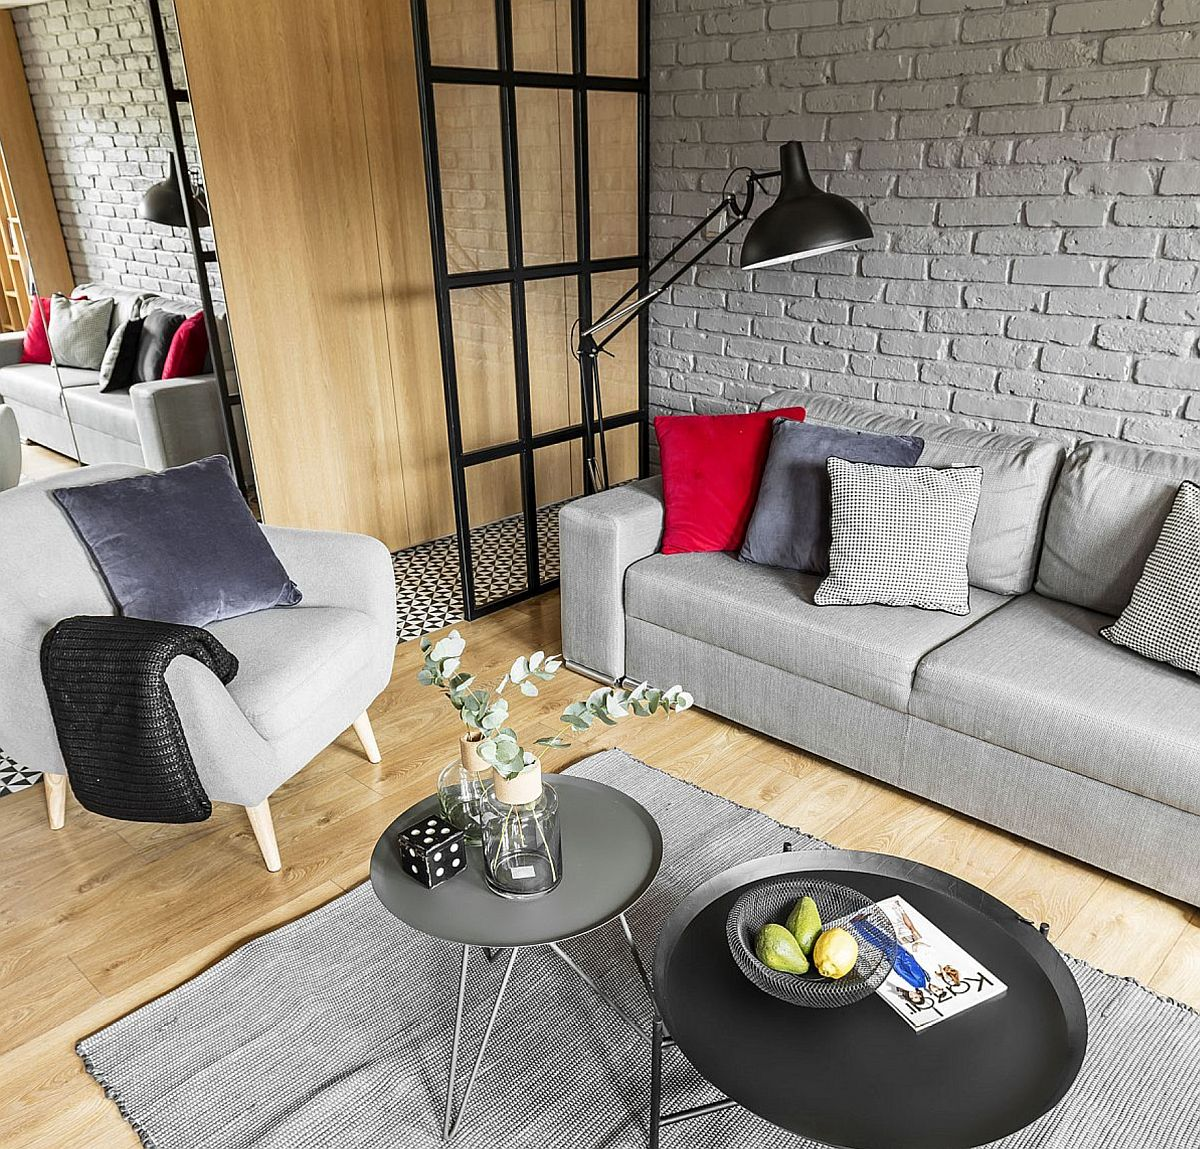 adelaparvu.com despre apartament 56 mp cu accente de rosu, design SAS Wnetrza i Kuchnie, Foto Strazynski Studio (3)